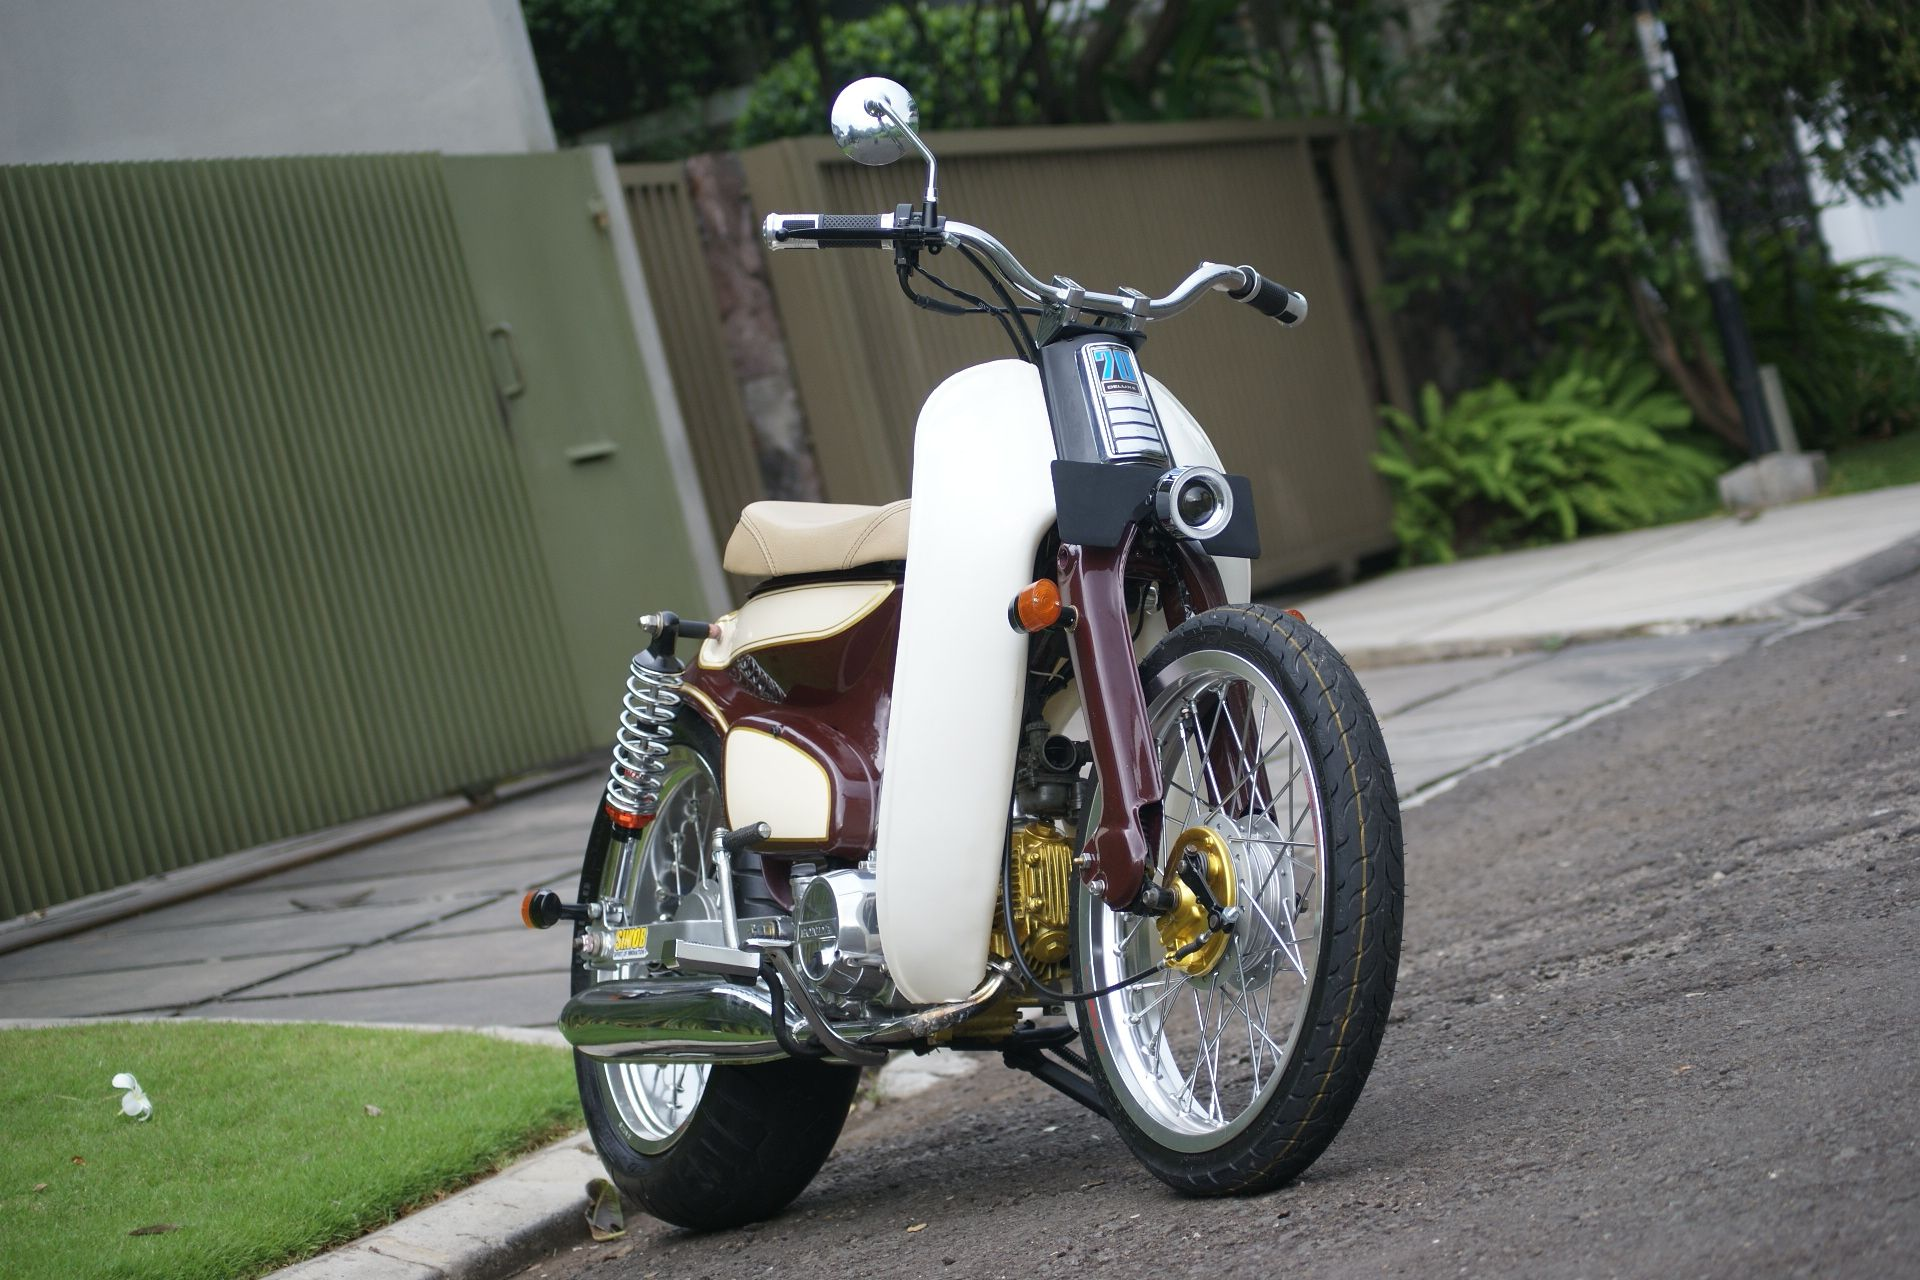 street cub by newspeed garage benzema motorcycle modification pinterest honda cub honda. Black Bedroom Furniture Sets. Home Design Ideas